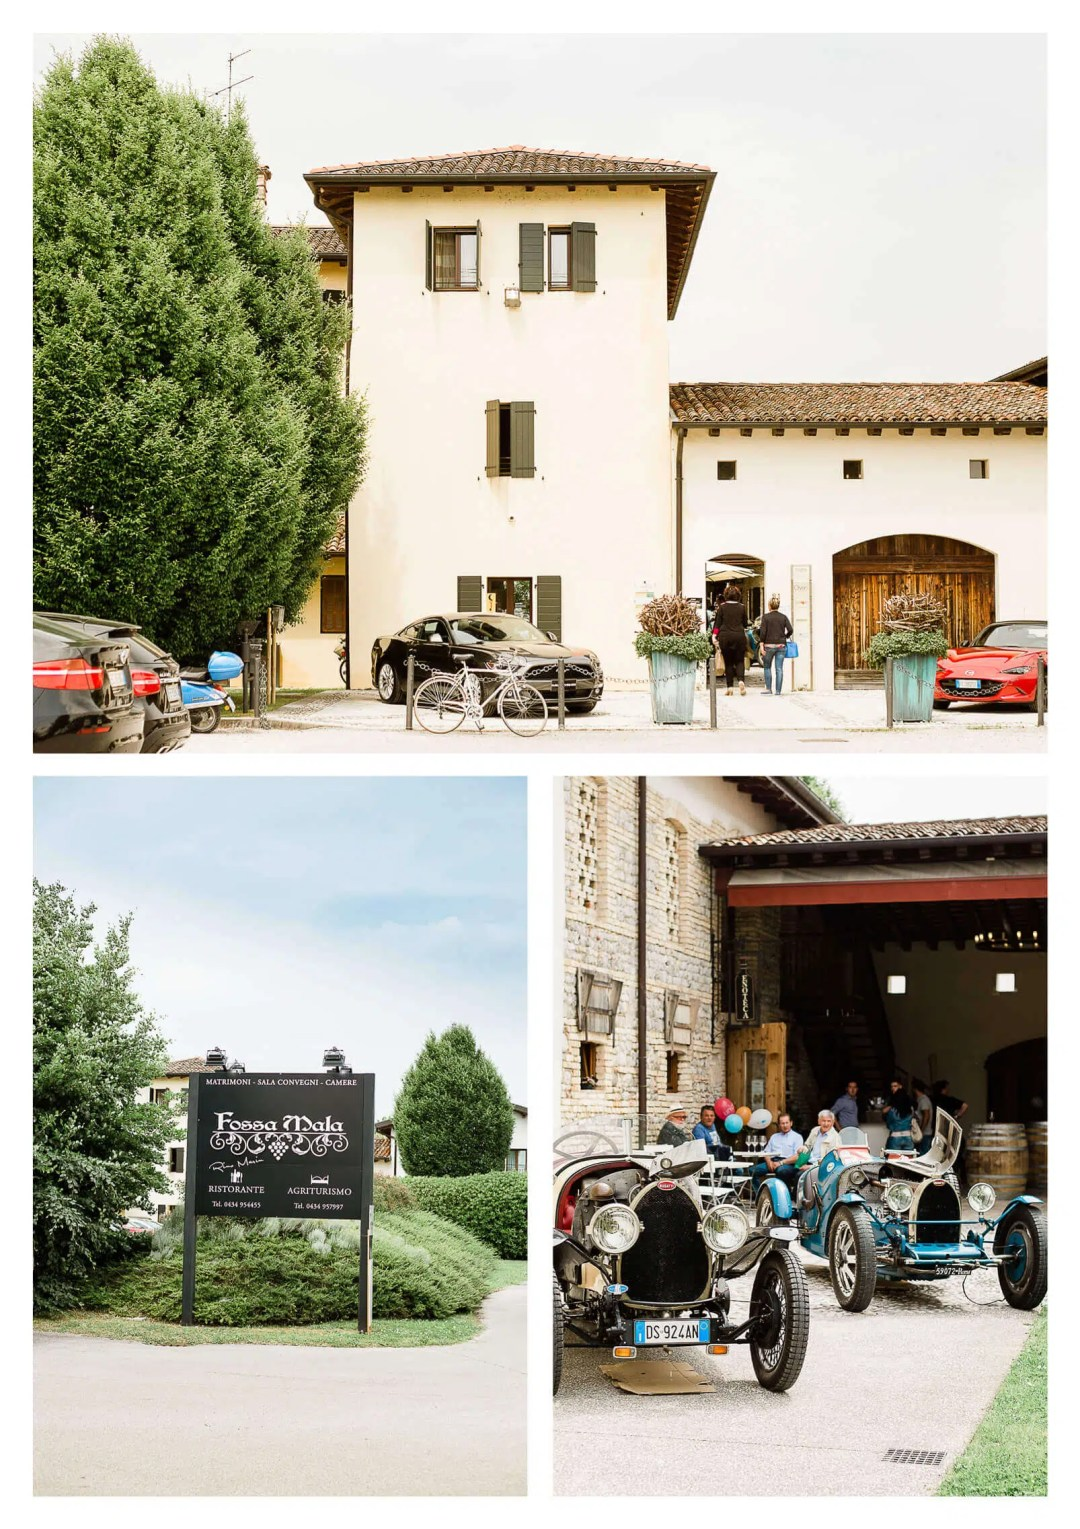 Fossa Mala vineyard wedding in Pordenone Italy | Destination wedding photographer